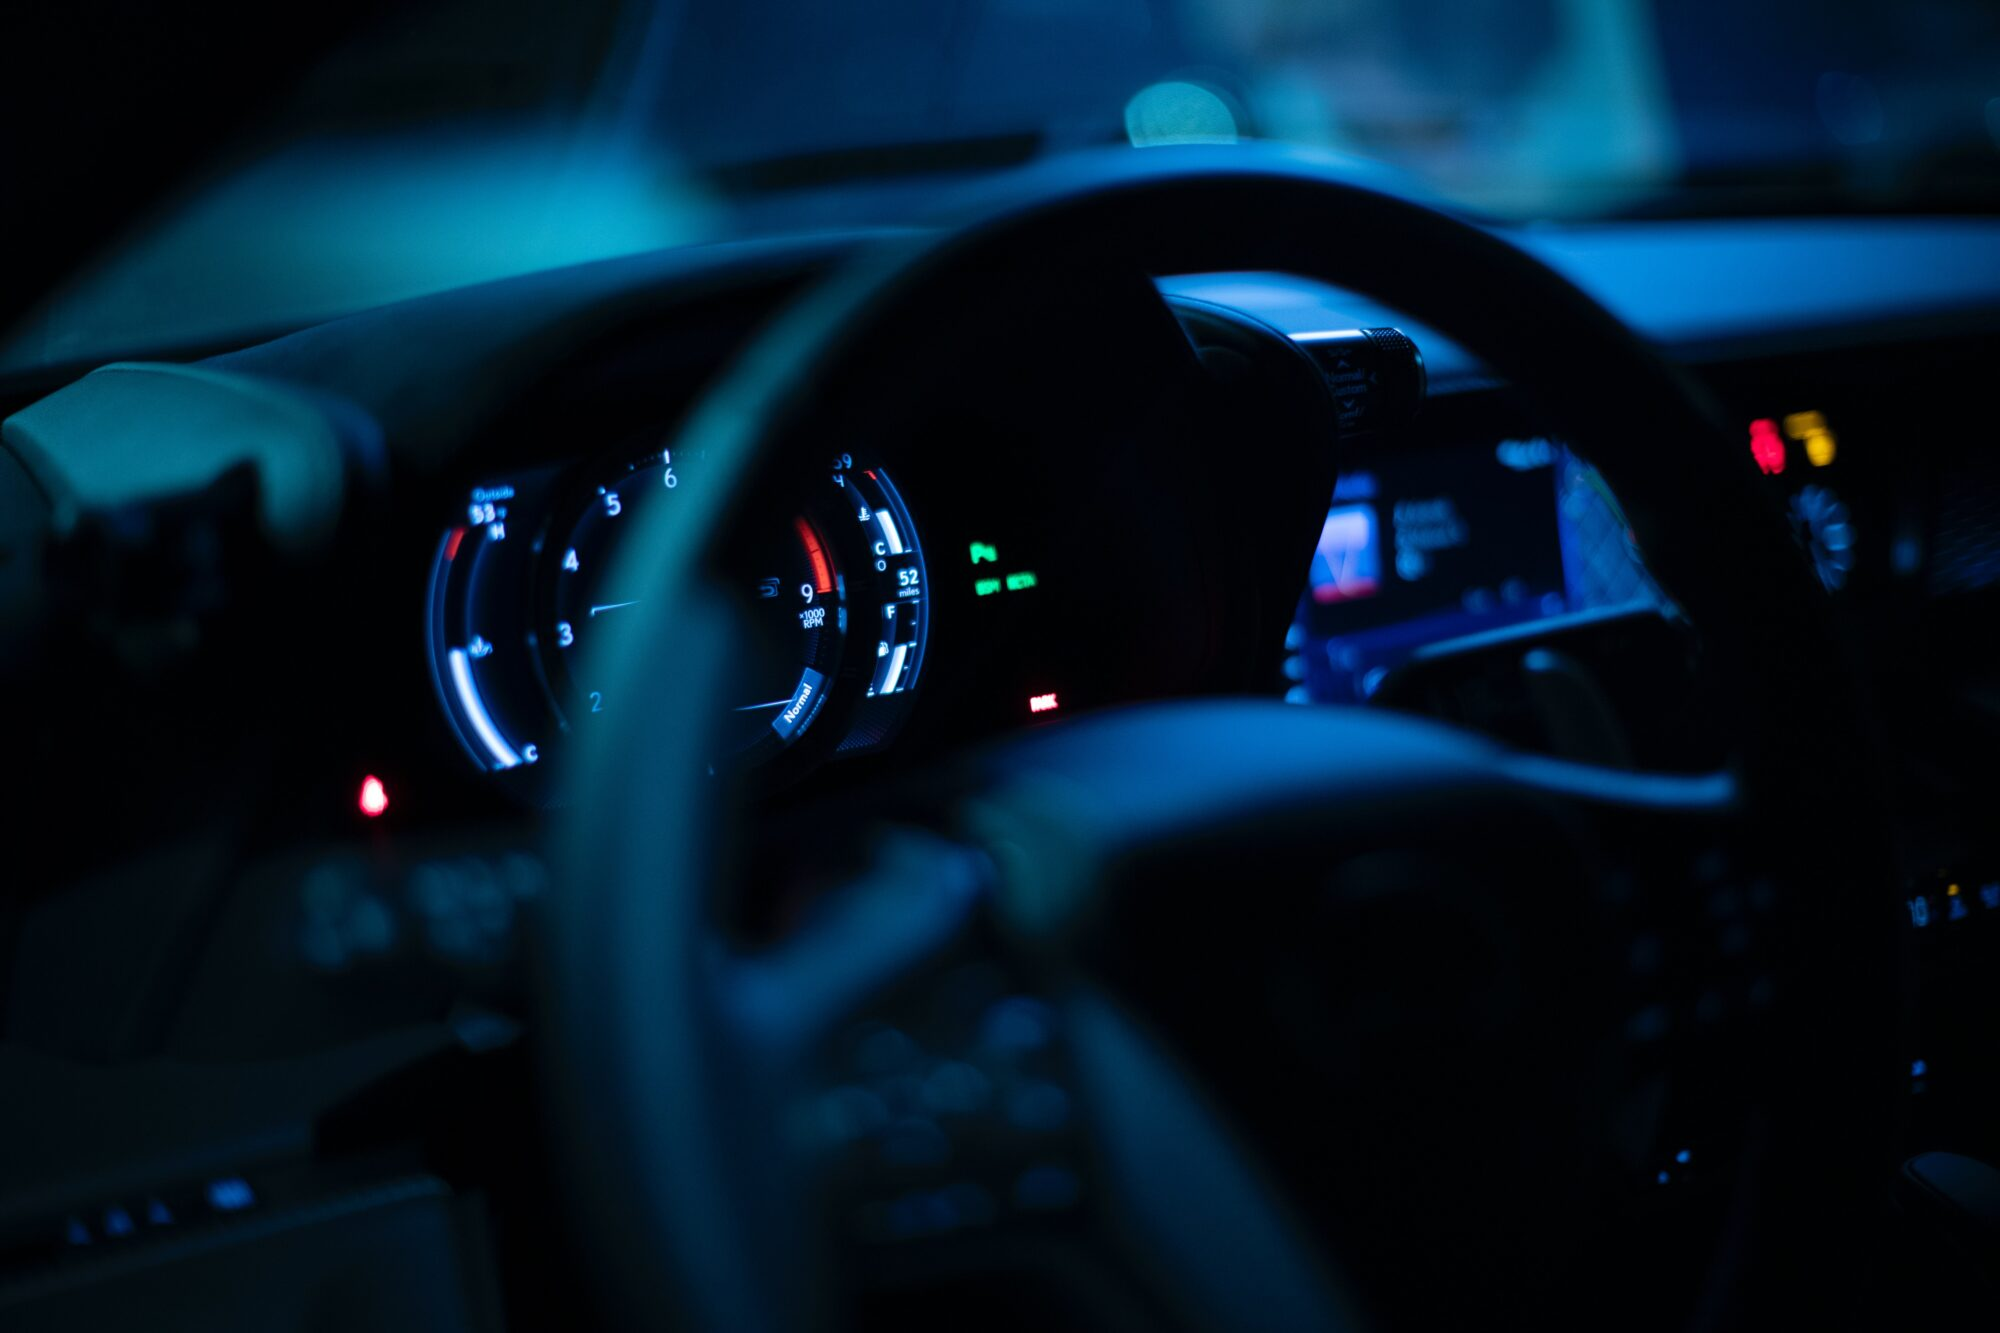 alexander w 0NBTqTunqek unsplash - Automotive Optics